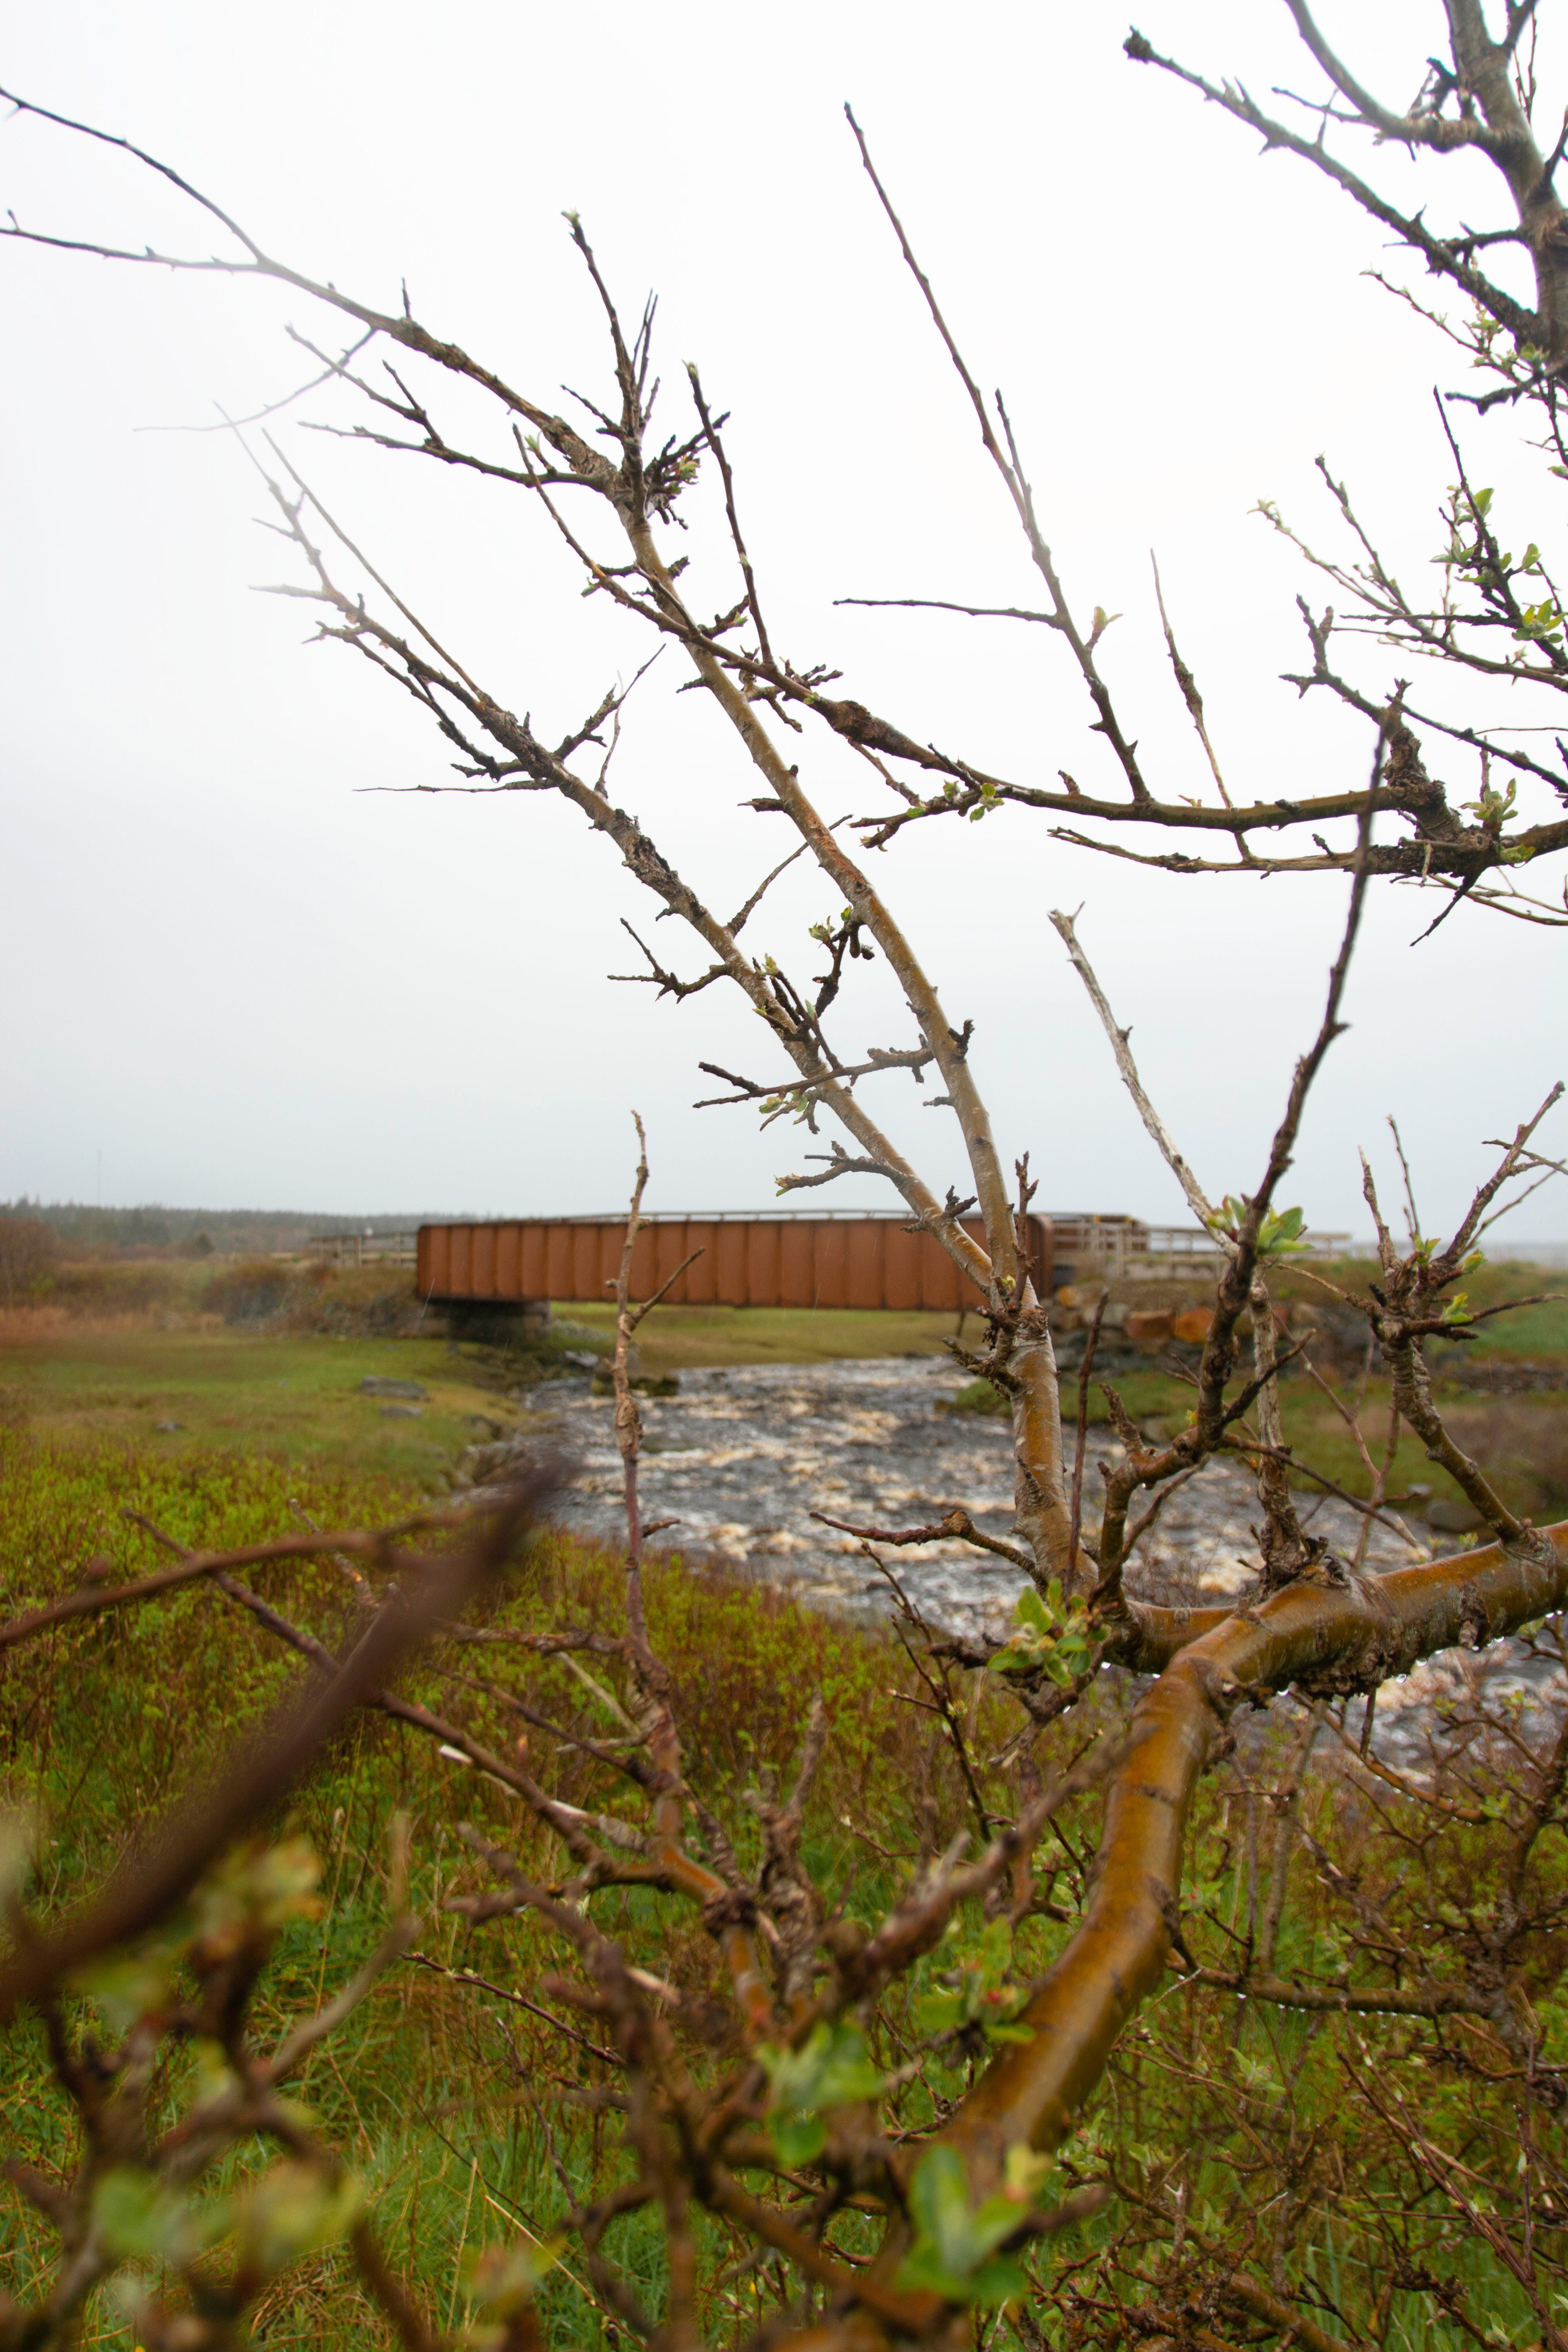 Bridge going across a river